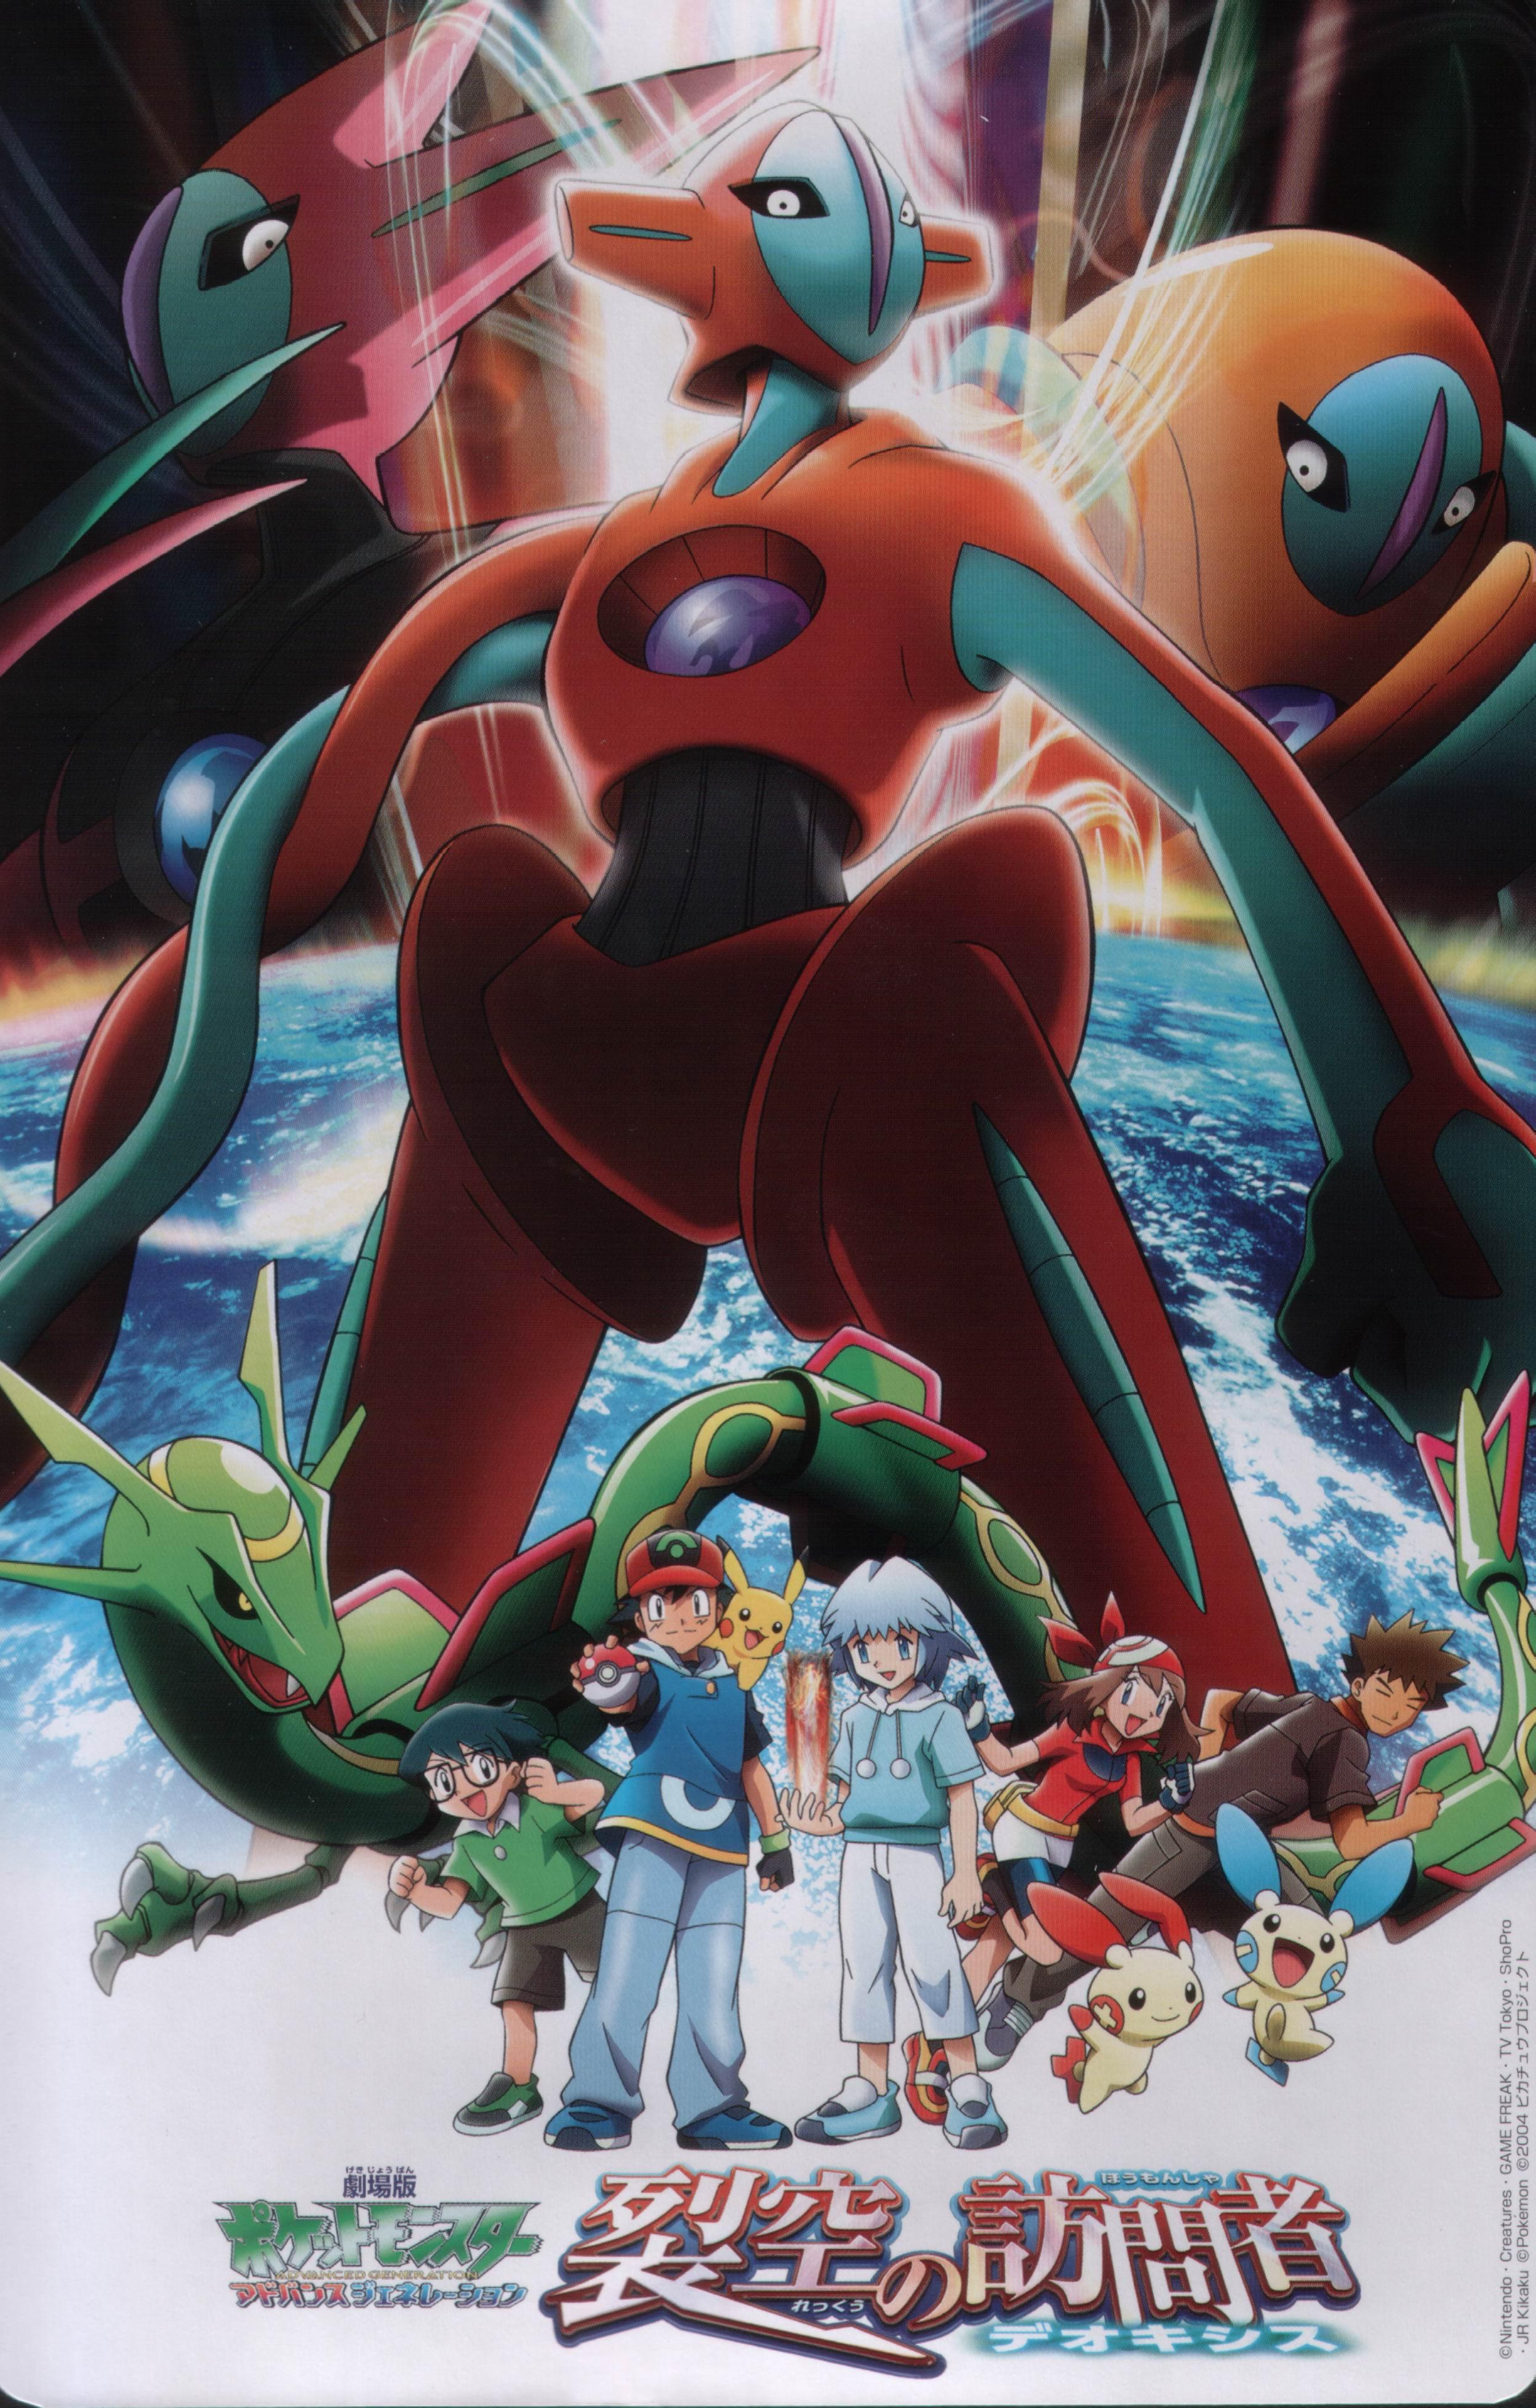 Pokemon Movies Pikachu Ash Ketchum May Pokemon Brock Posters